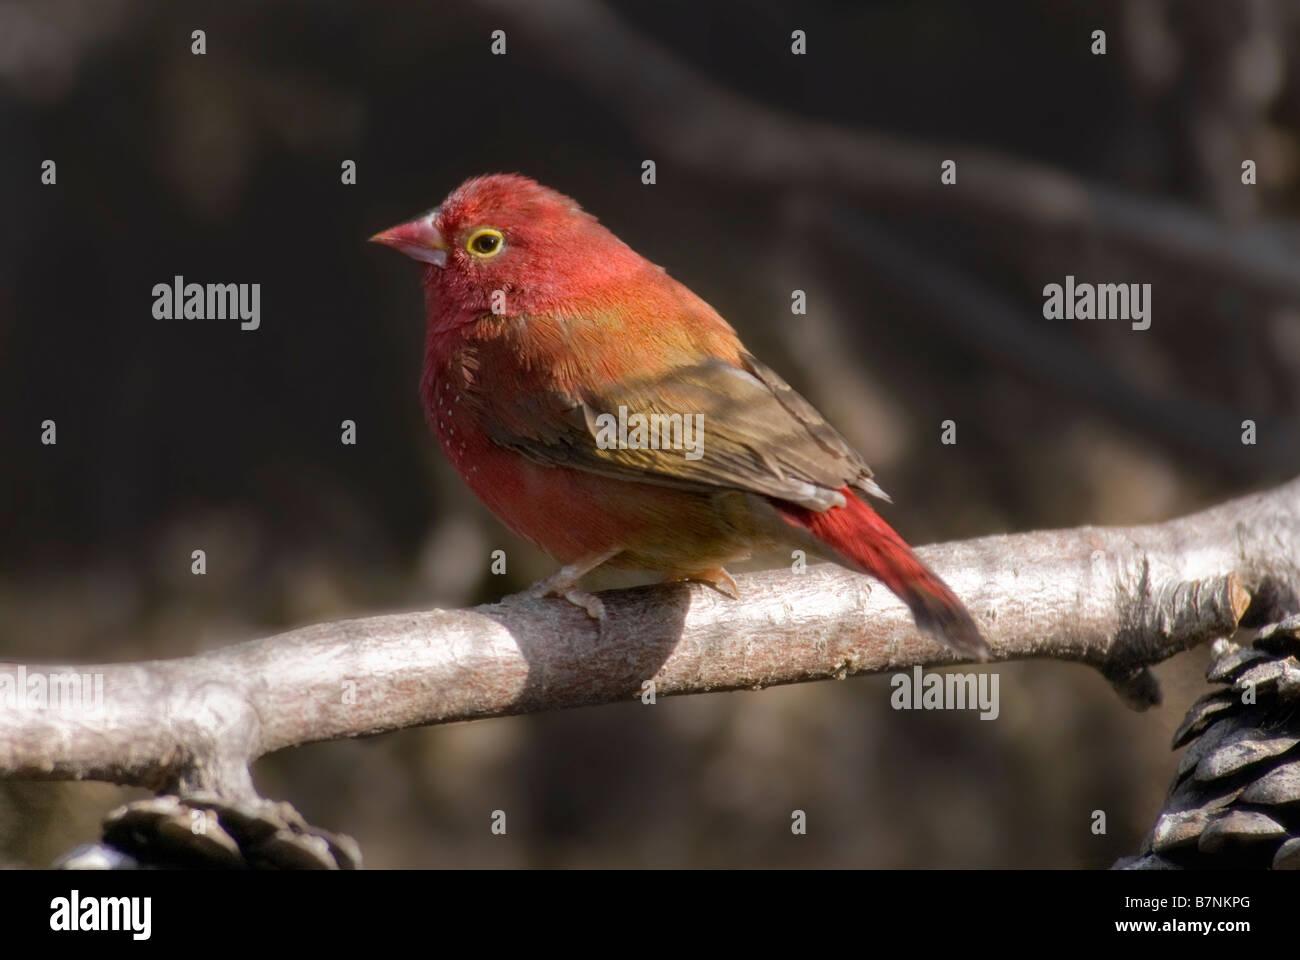 Red-billed Firefinch male 'Lagonosticta senegala' Stock Photo